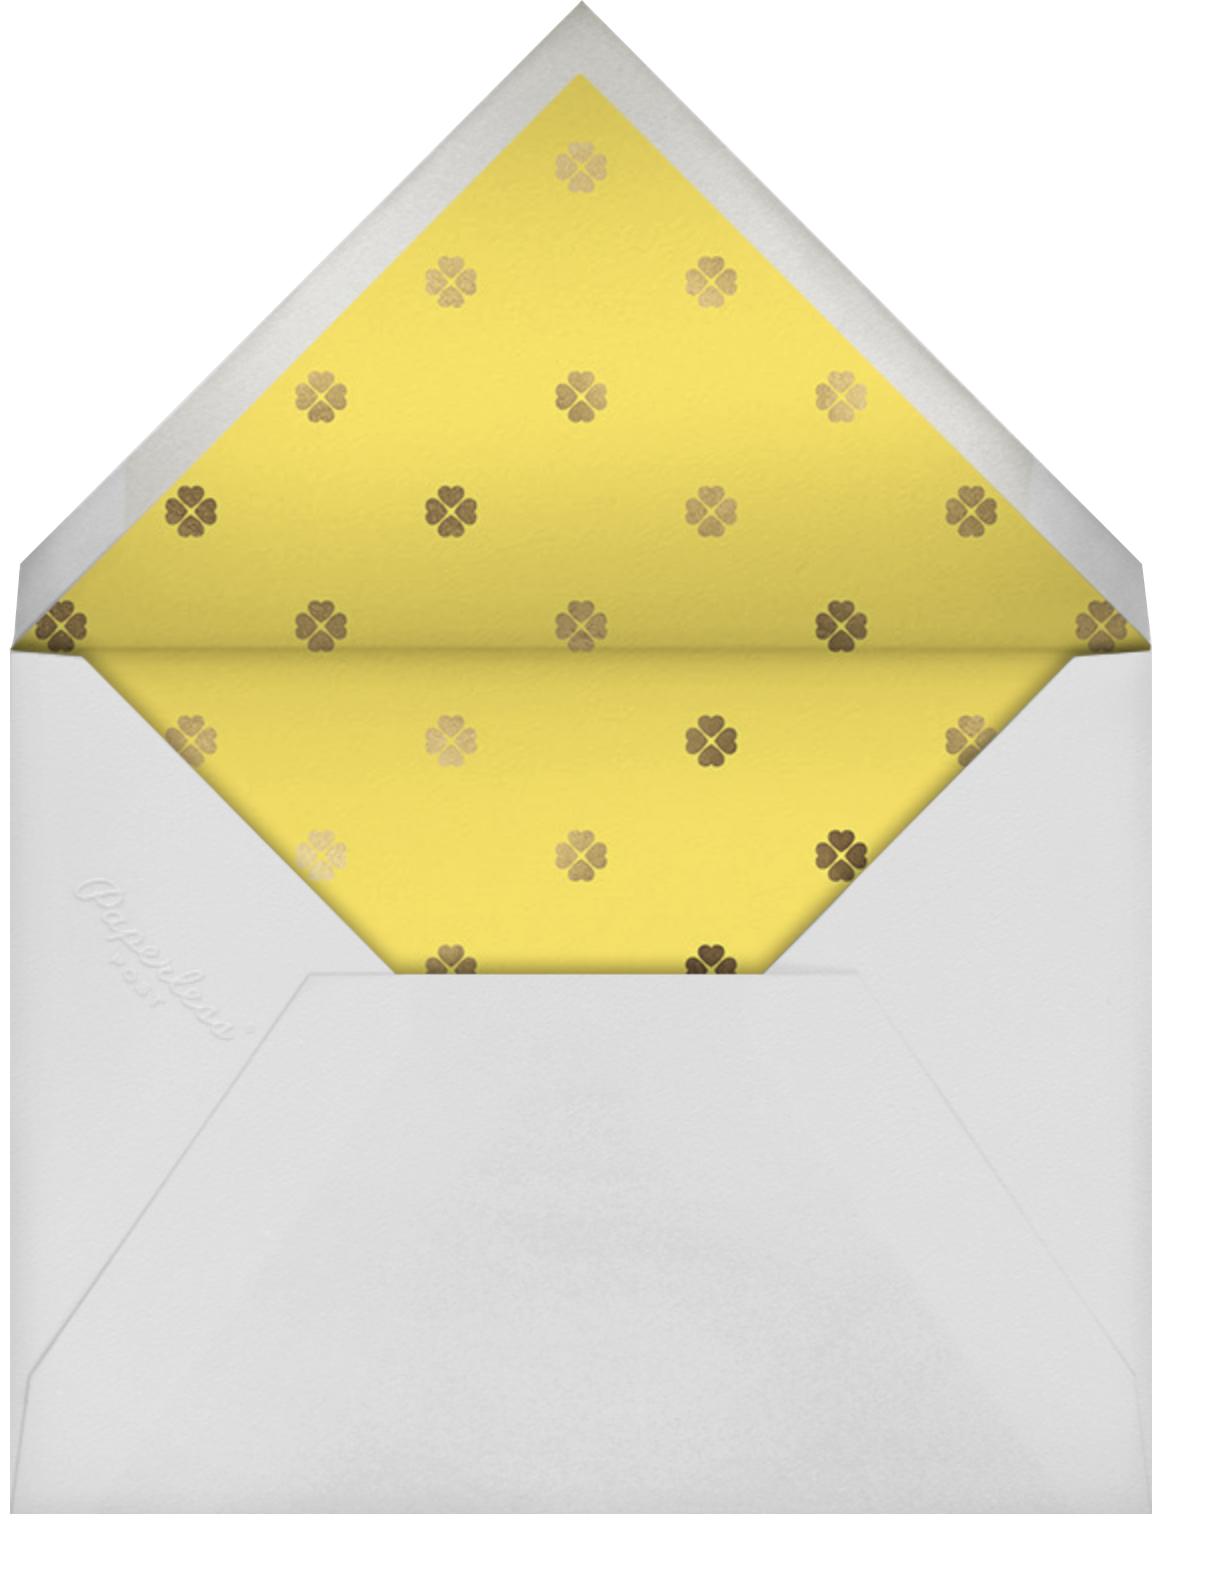 Colorblocked Border - Yellow/Pavlova - kate spade new york - Adult birthday - envelope back